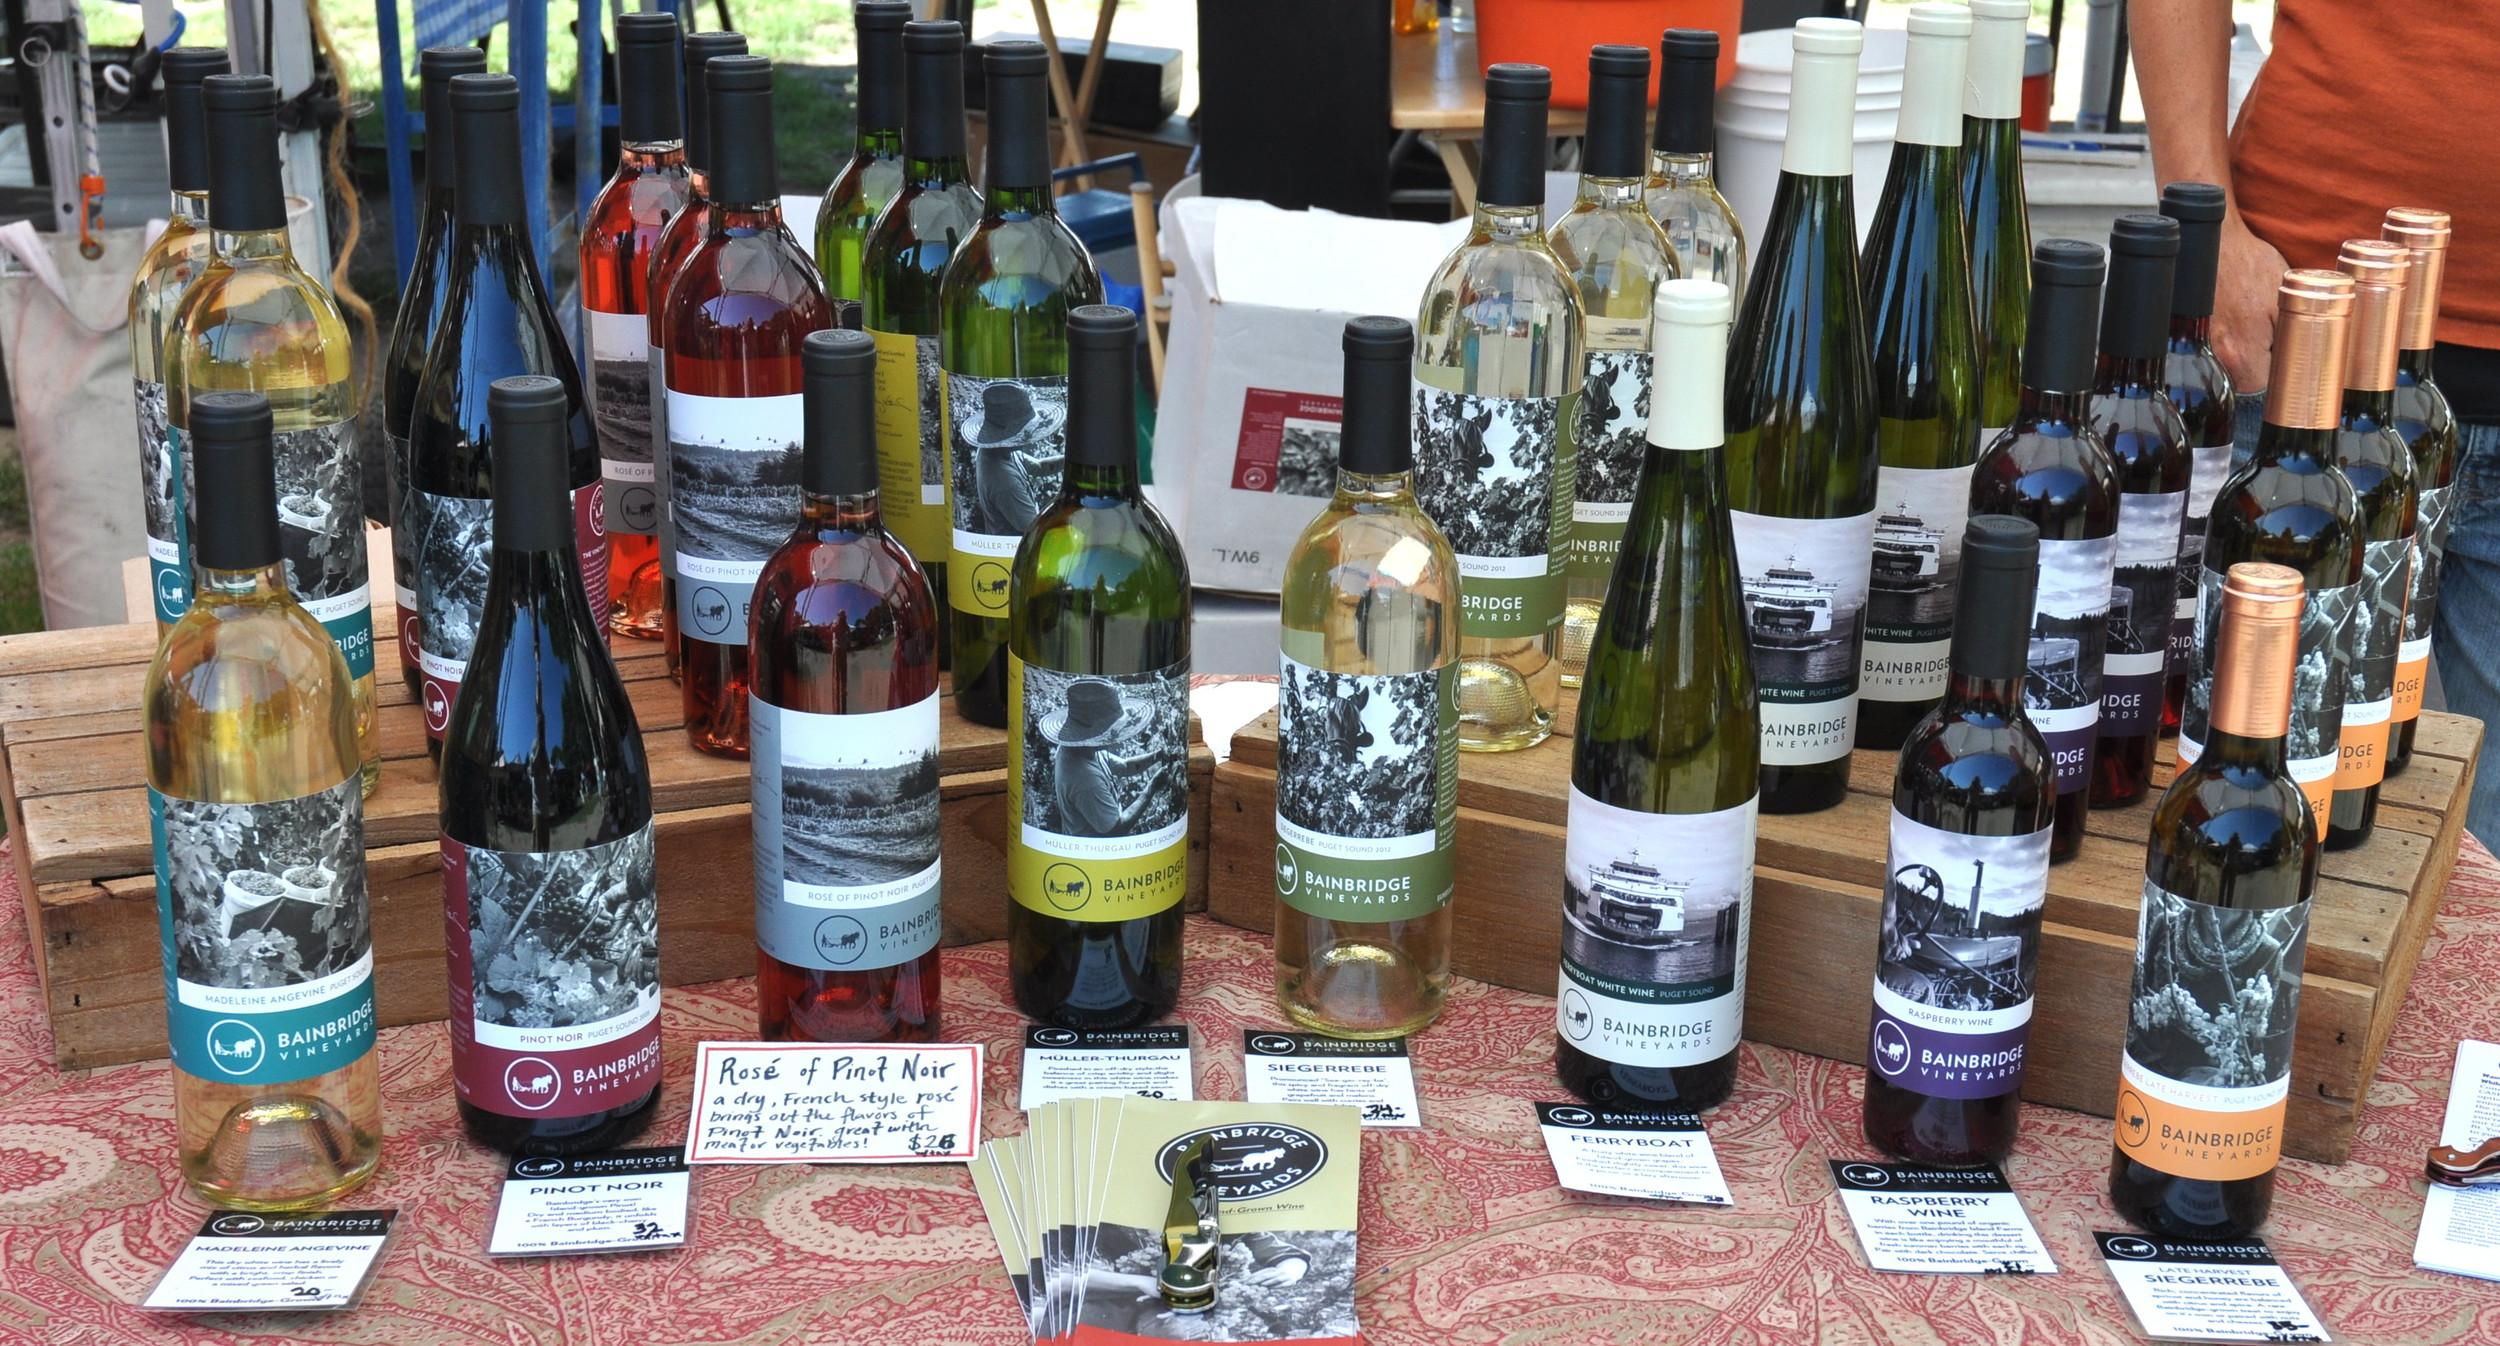 The wines of Bainbridge Island Vineyards. Photo copyright 2014 by Zachary D. Lyons.